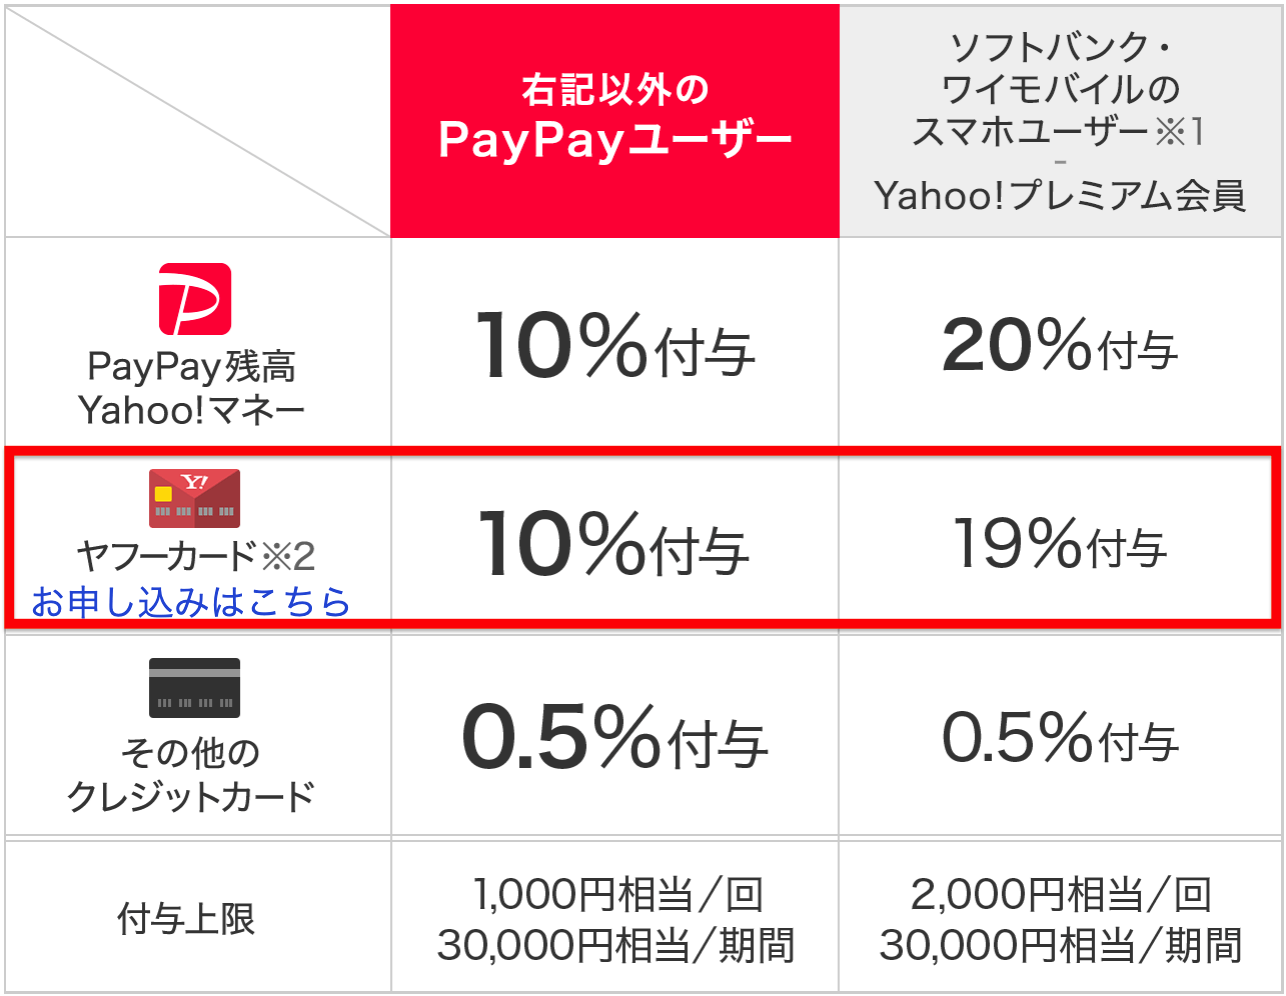 PayPayキャンペーン(2019年6月版)